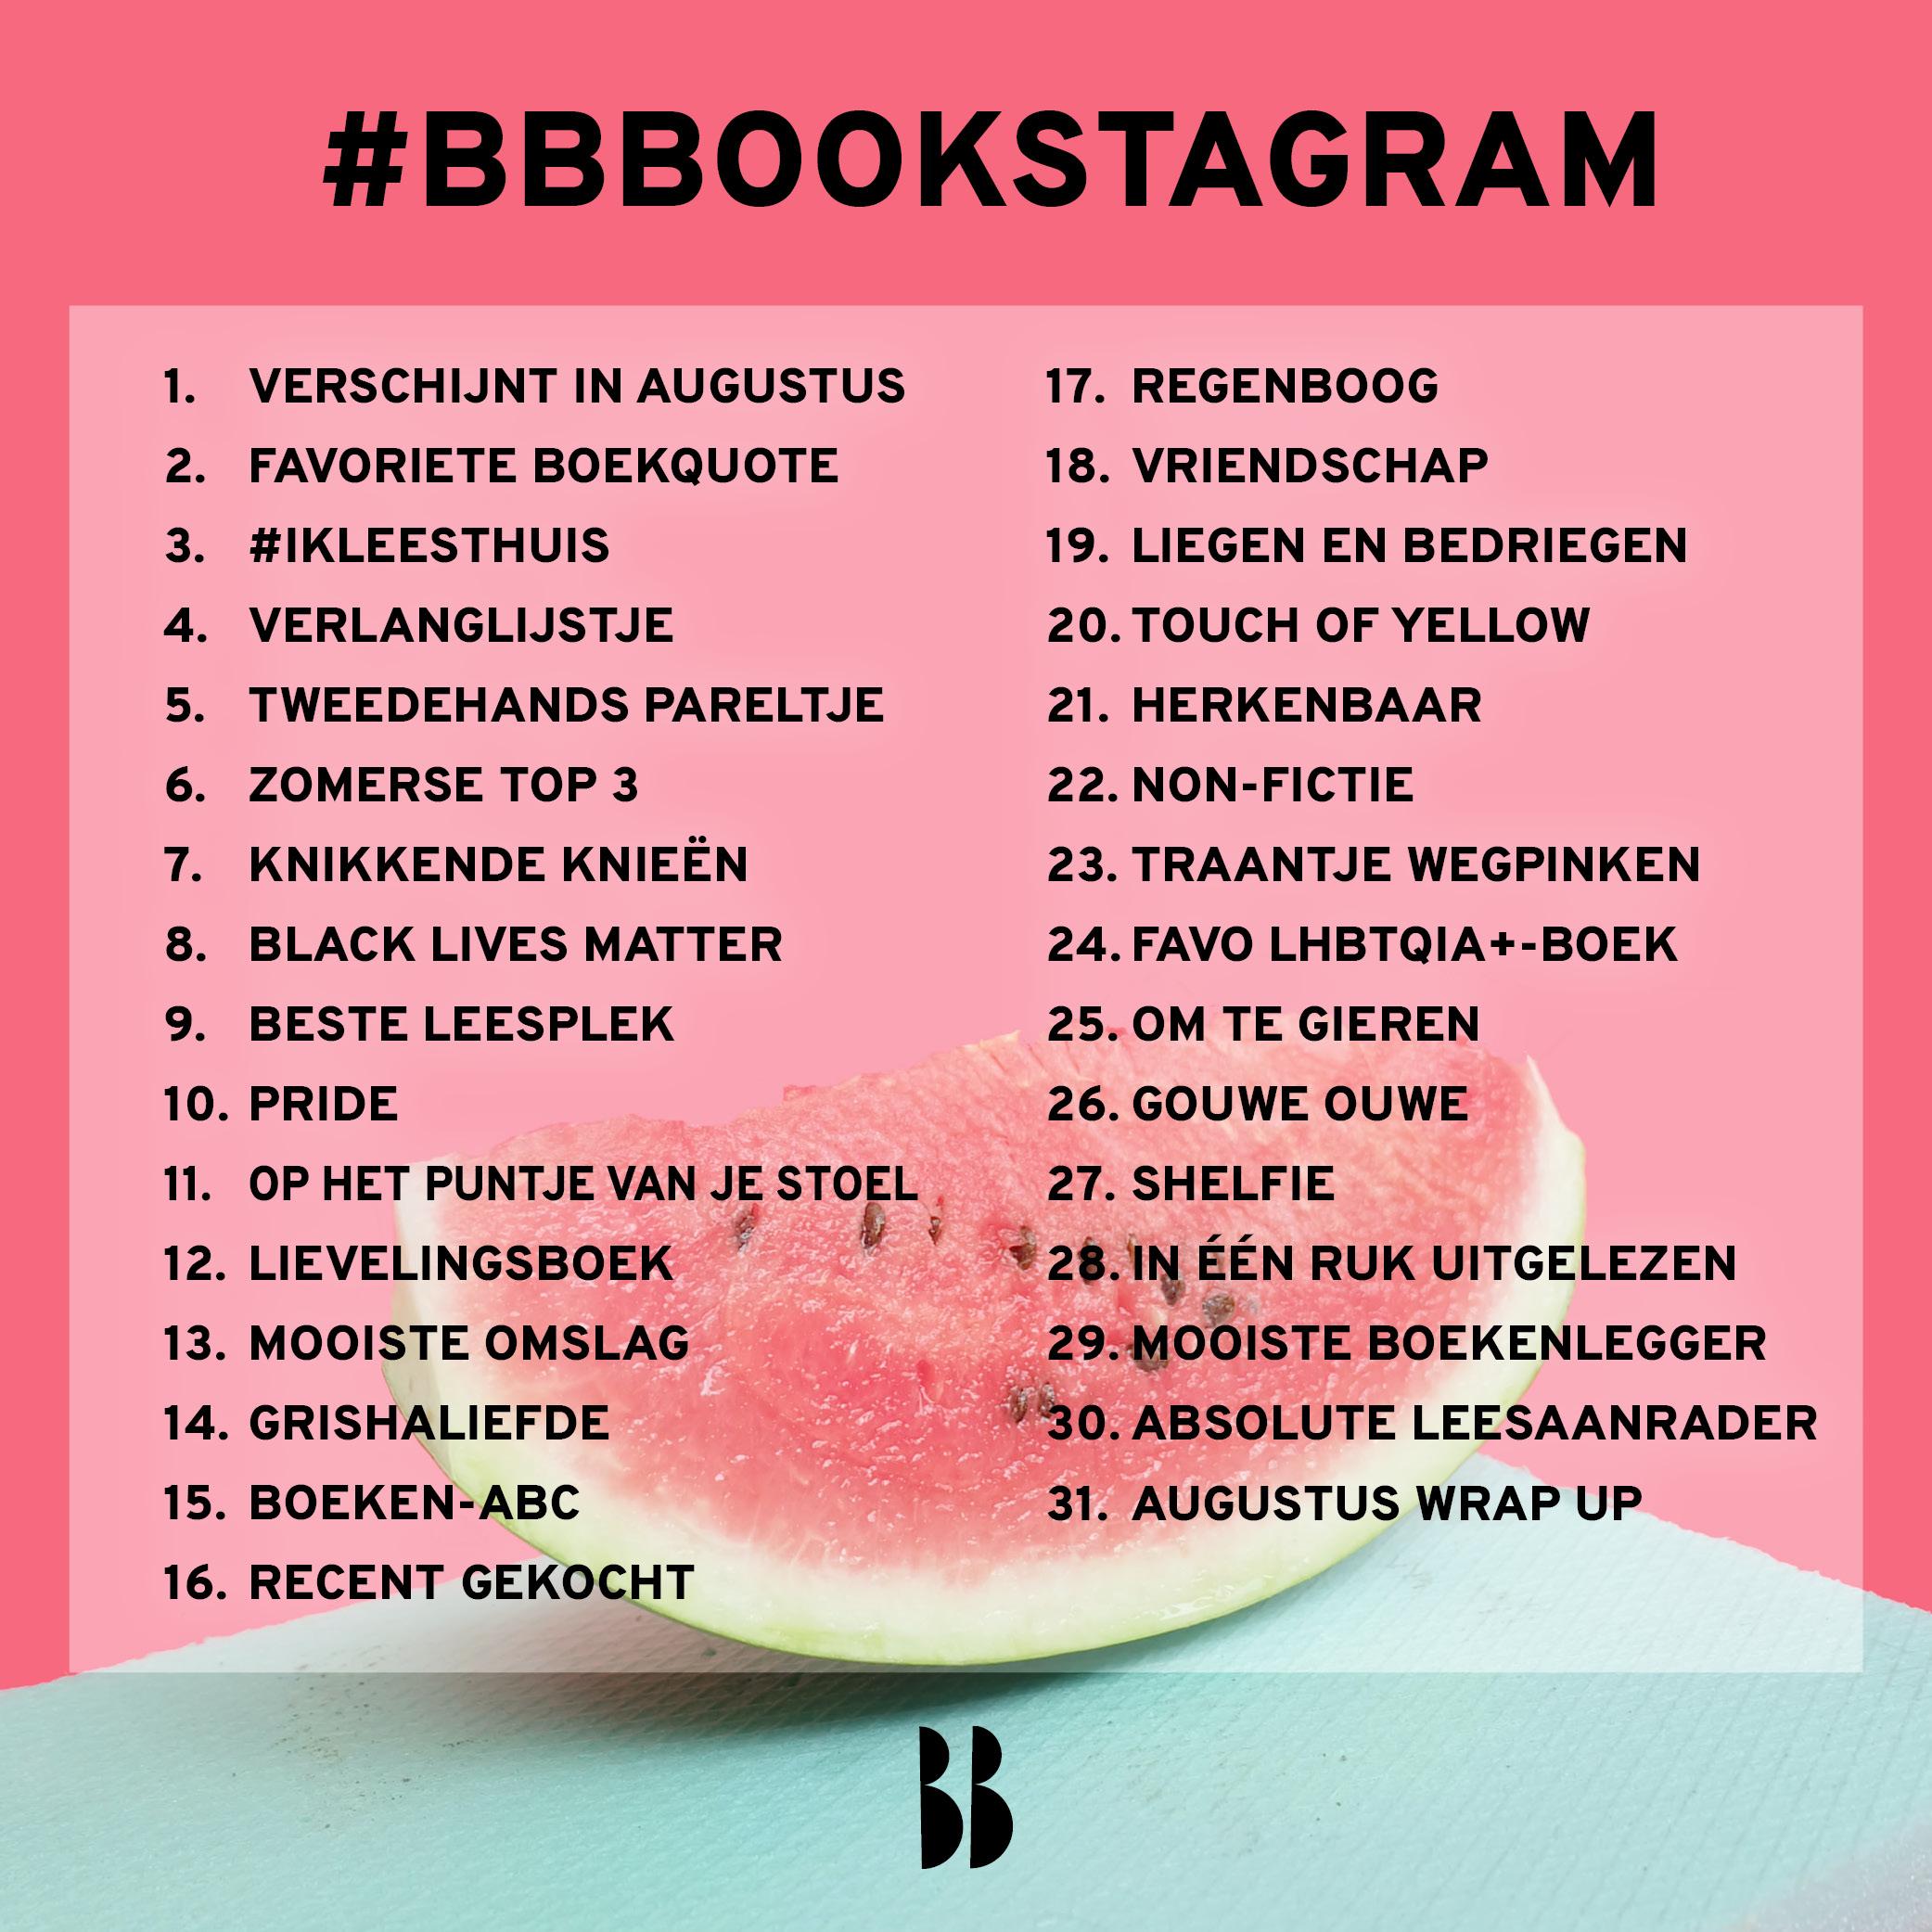 BBBookstagram 2020